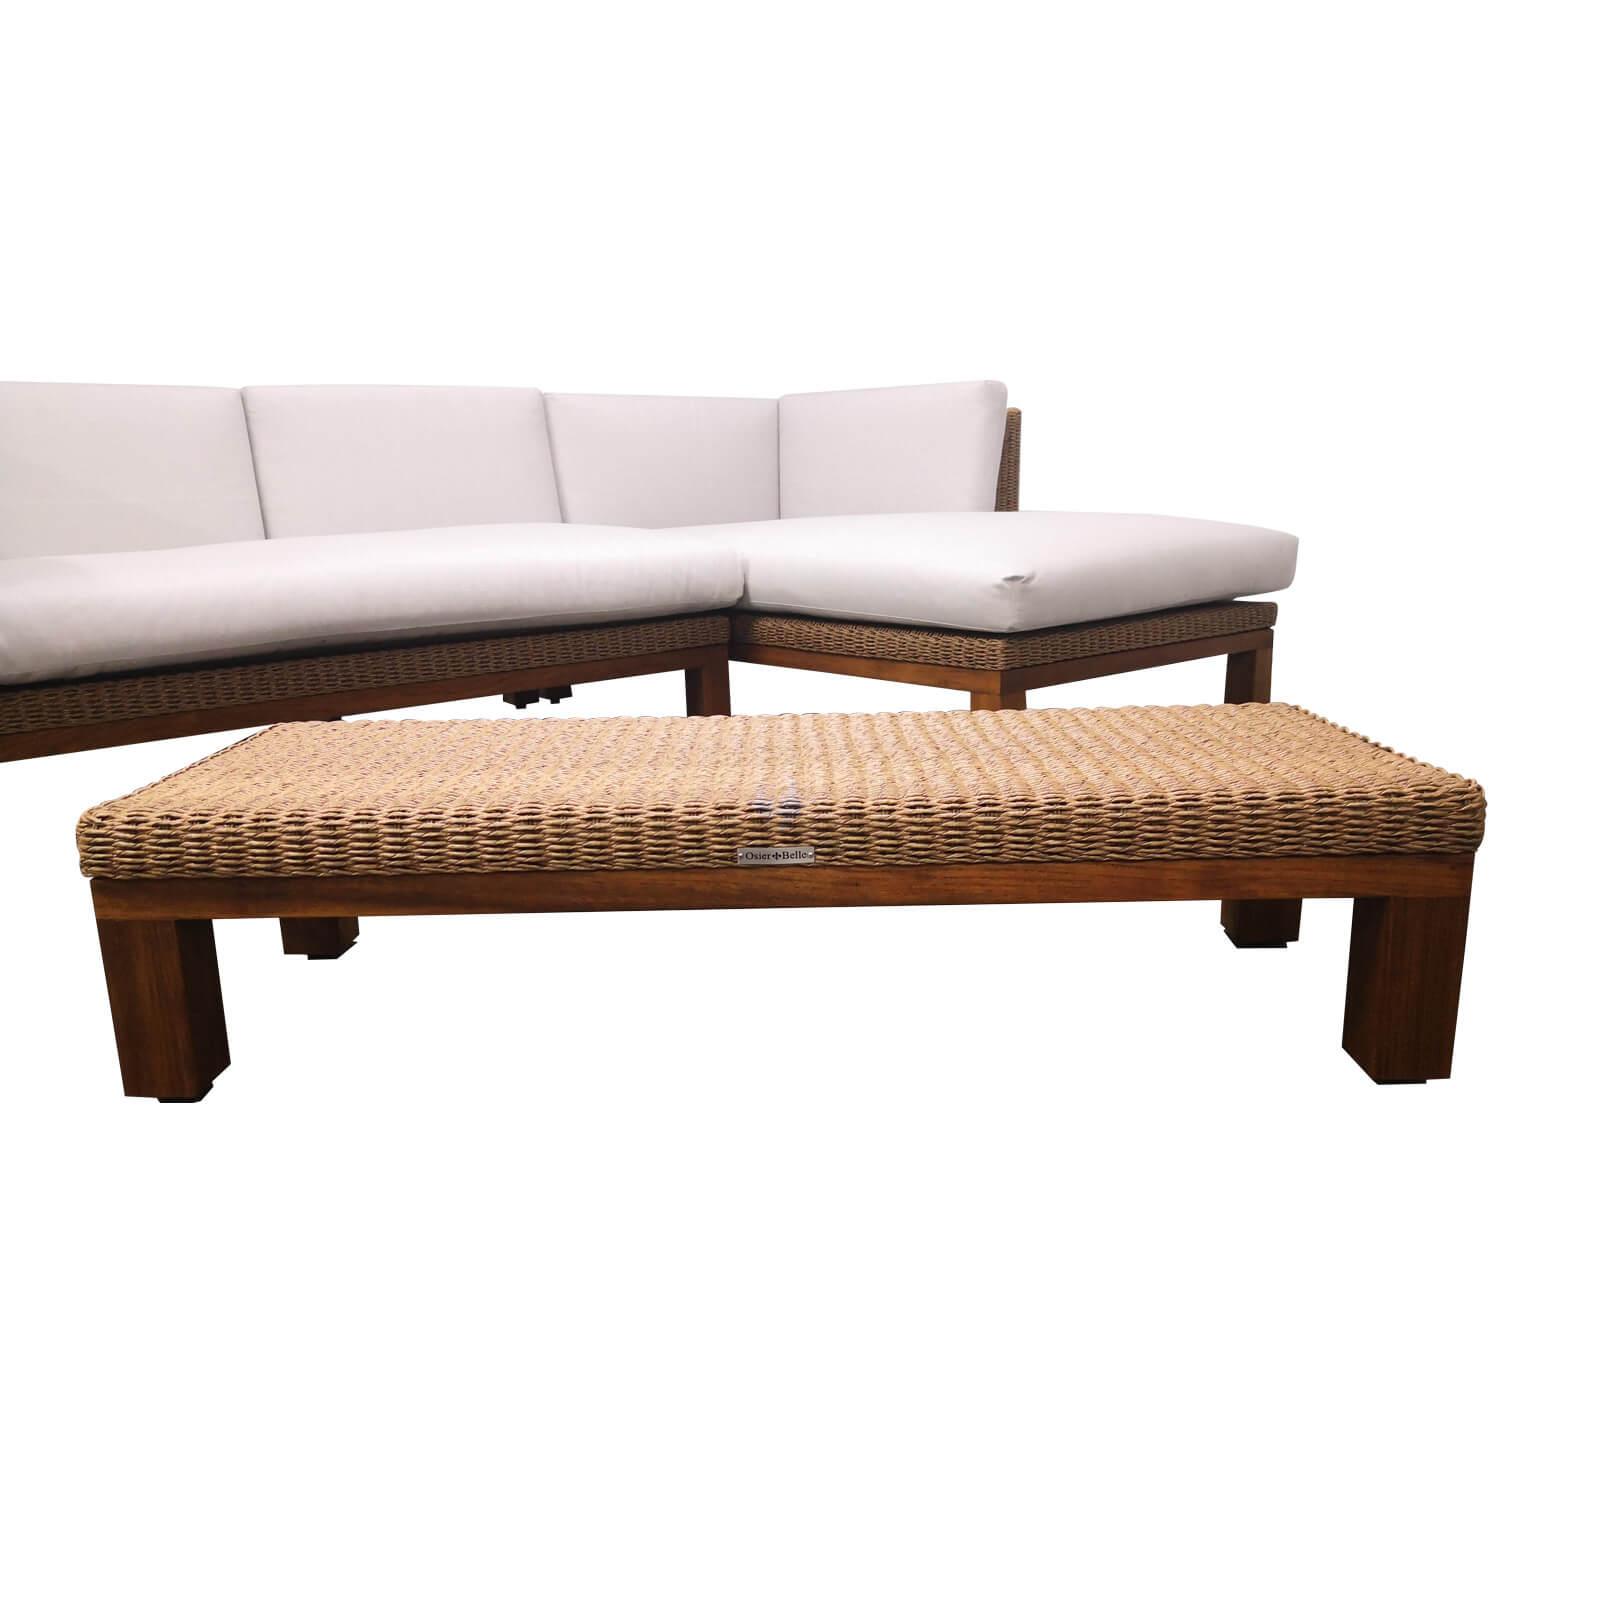 Two Design Lovers outdoor furniture teak and wicker coffee table Osier Belle Joli